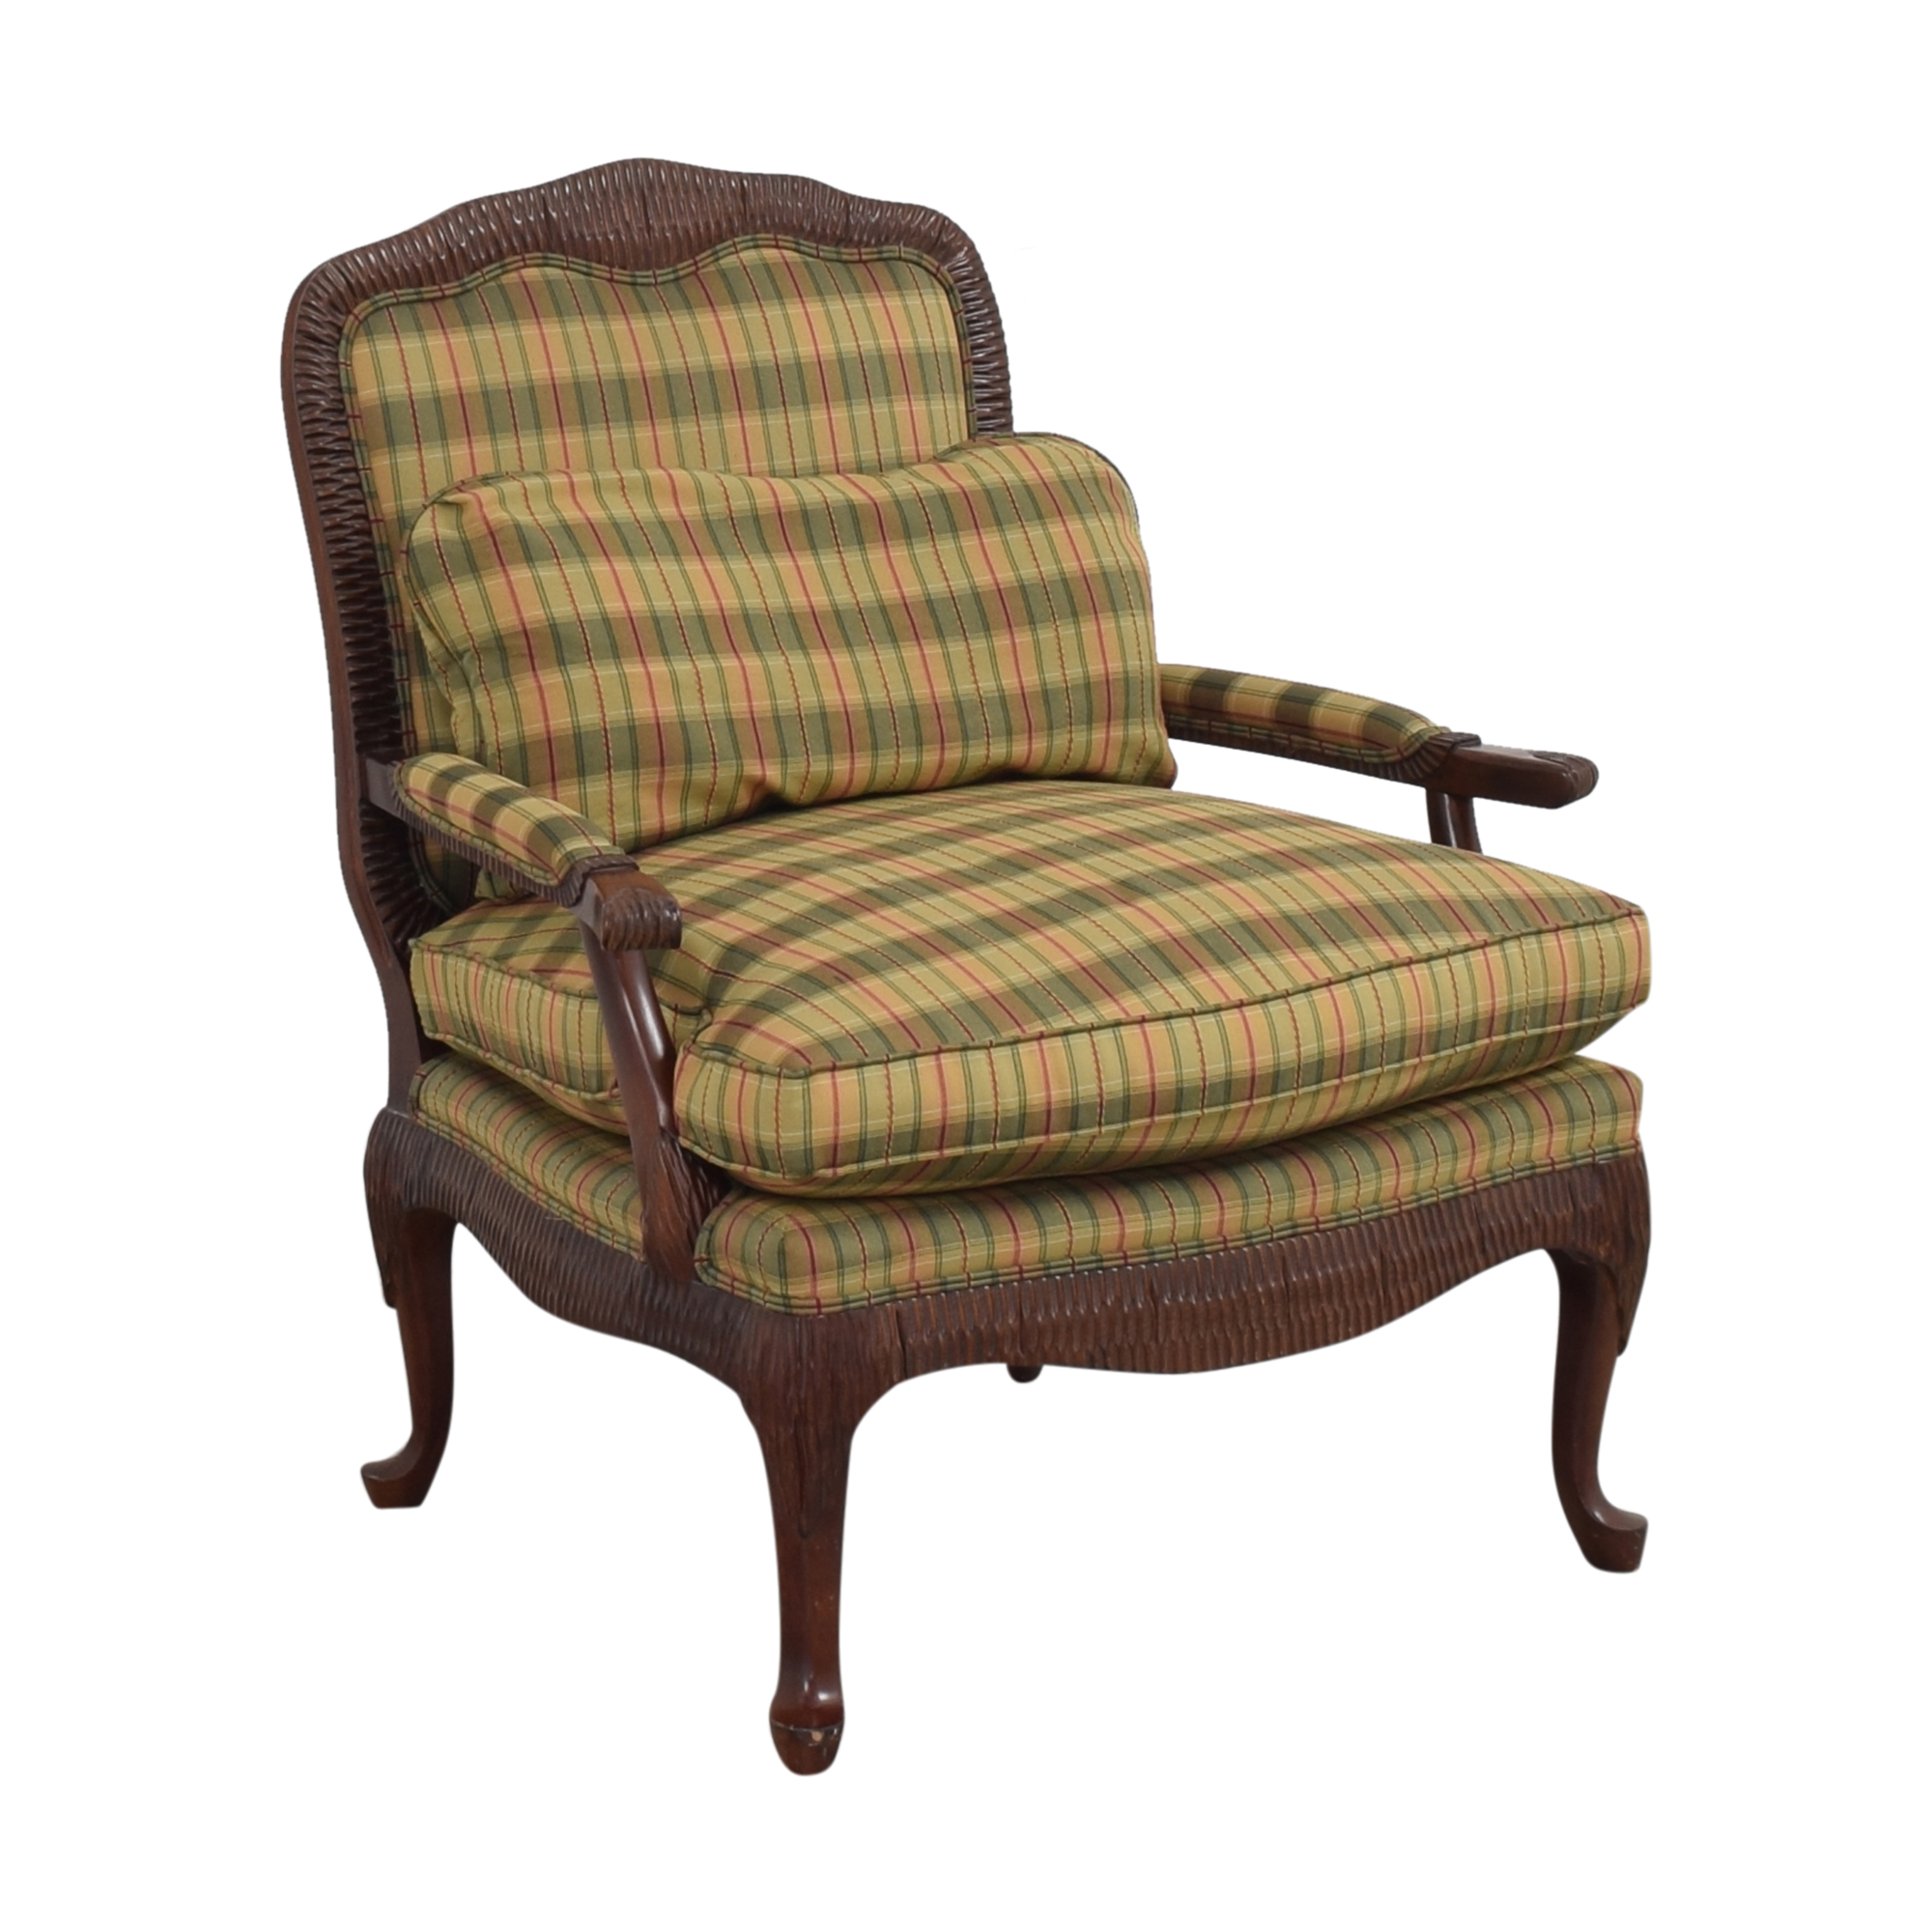 Lexington Furniture Lexington Furniture Upholstered Accent Chair for sale